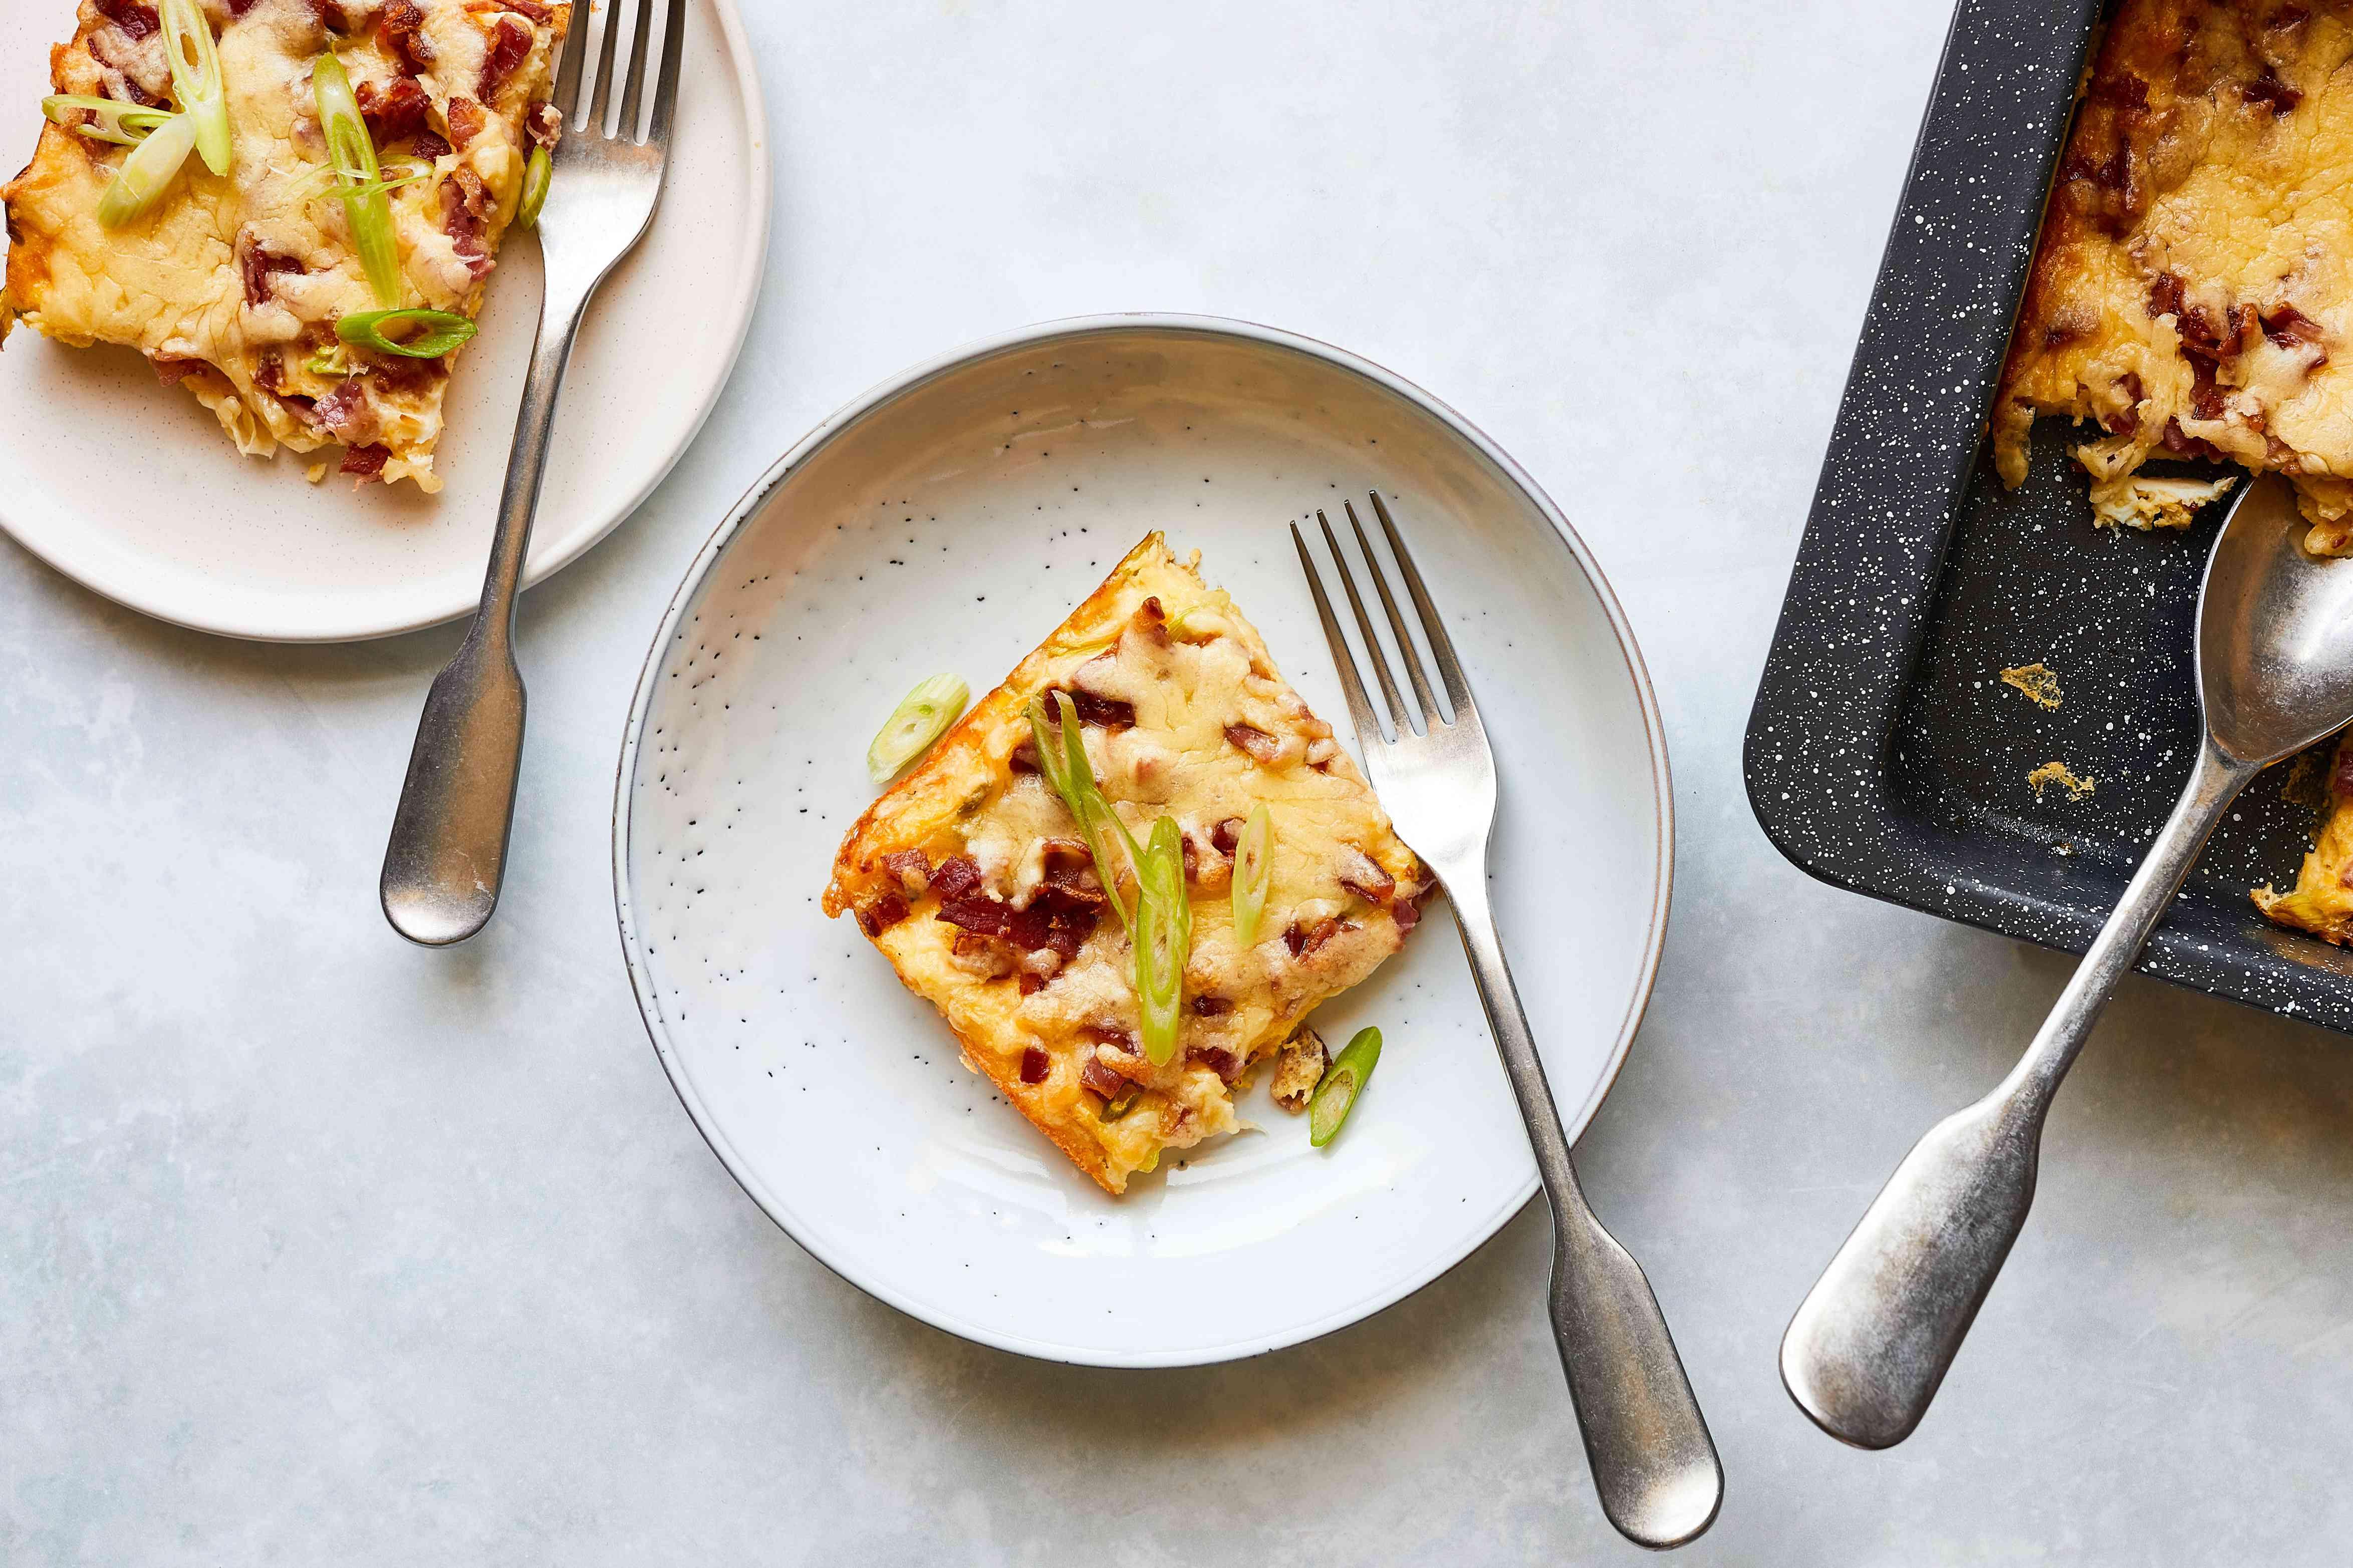 Make-Ahead Bacon and Egg Breakfast Casserole